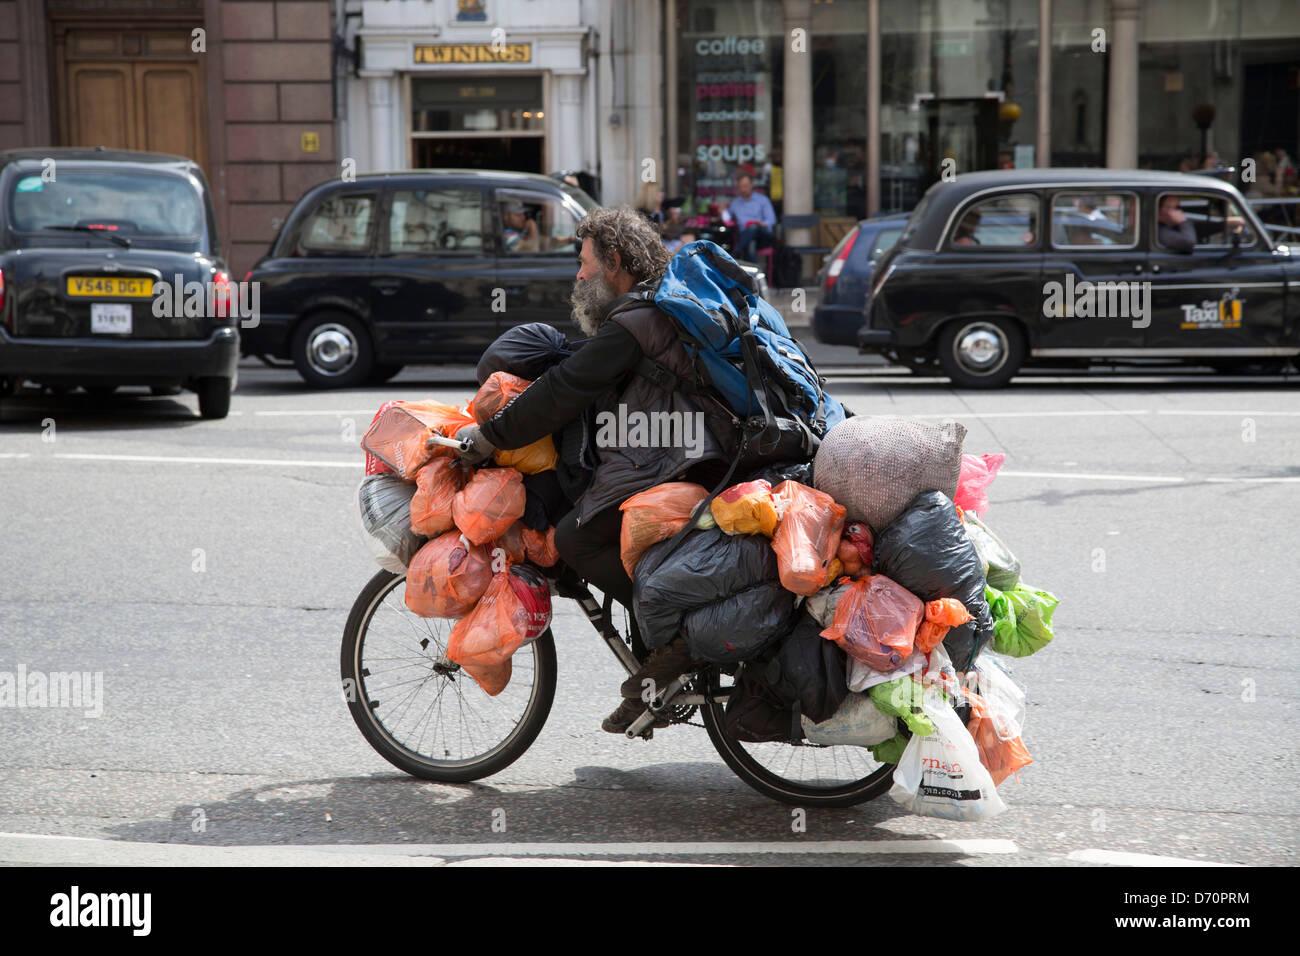 Tramp bag man bagman cycling through london weighed down ...